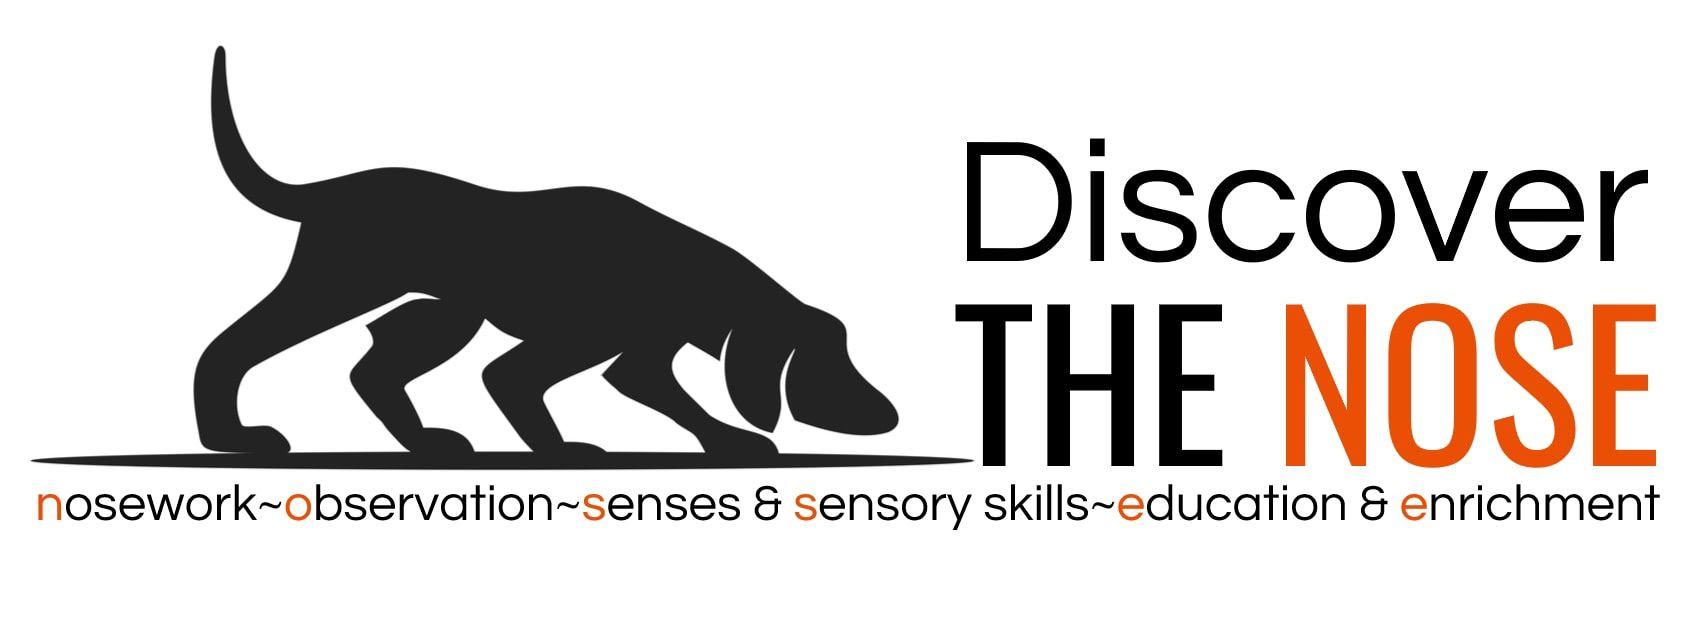 Image Result For Nosework Clipart Canine Clip Art Canine Logo Design